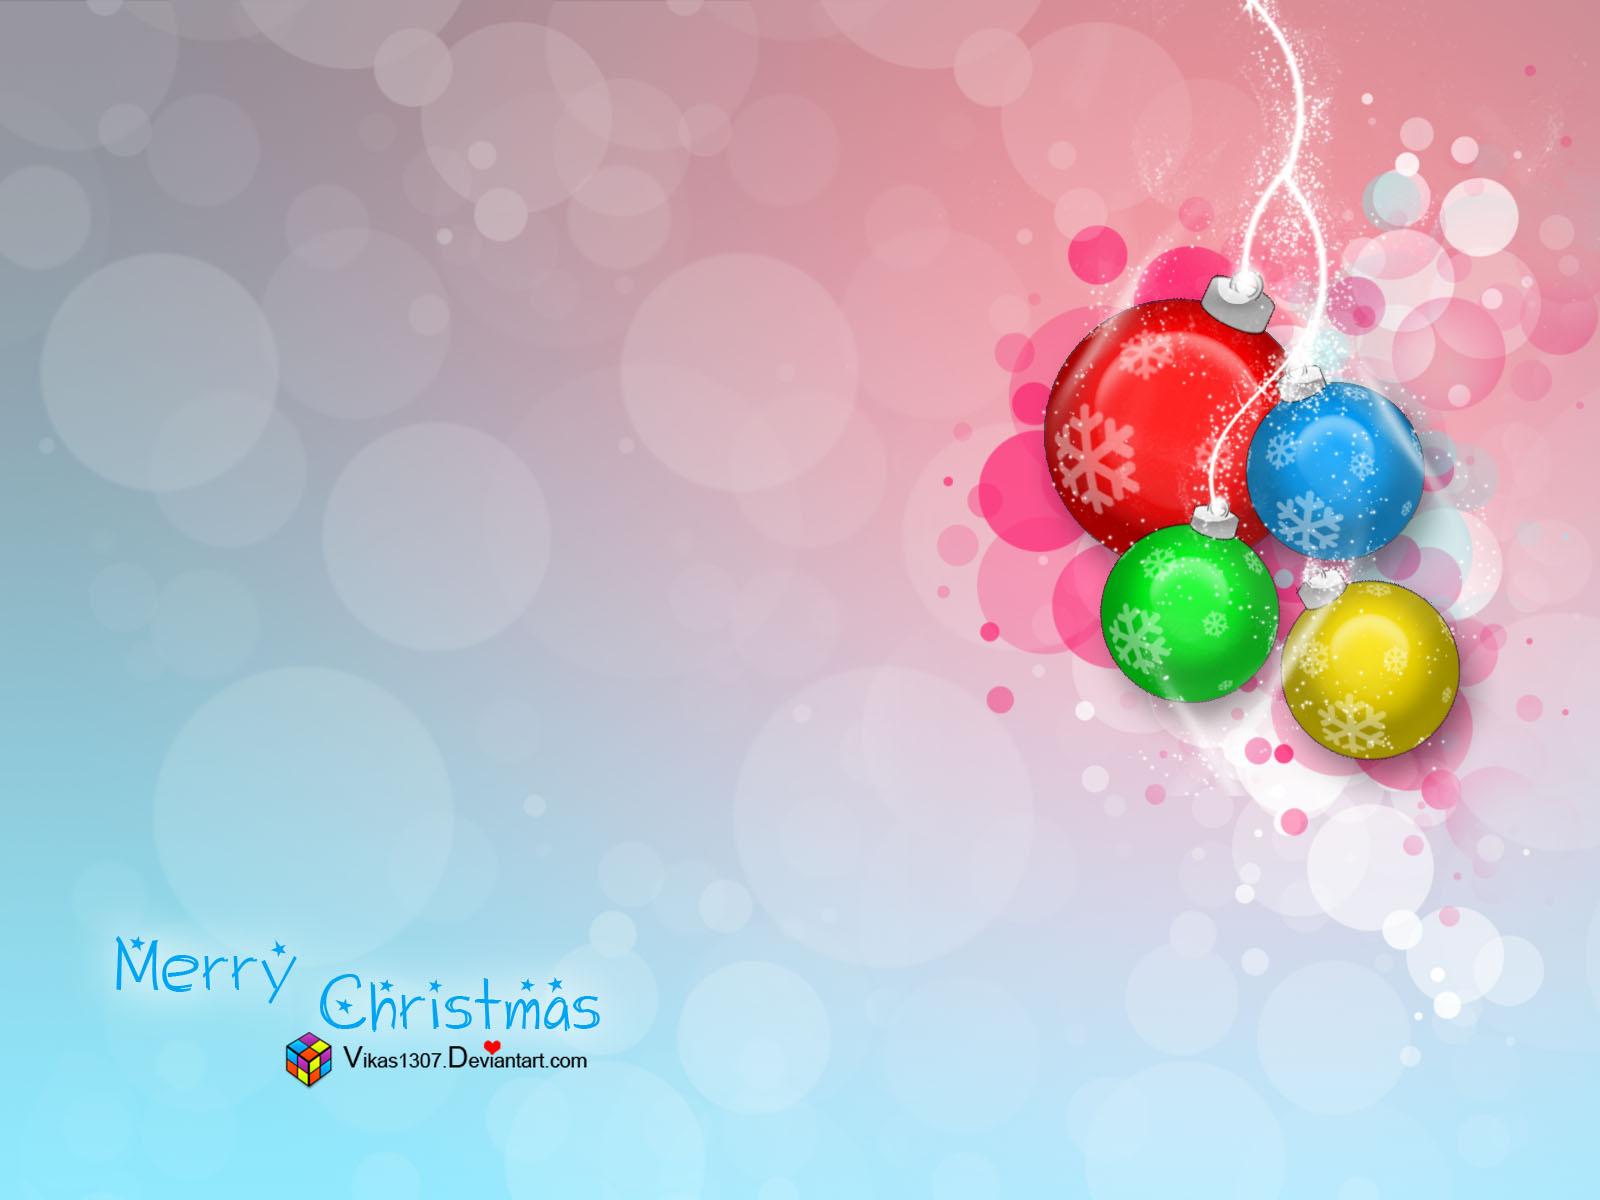 ...:: Merry Christmas :::....